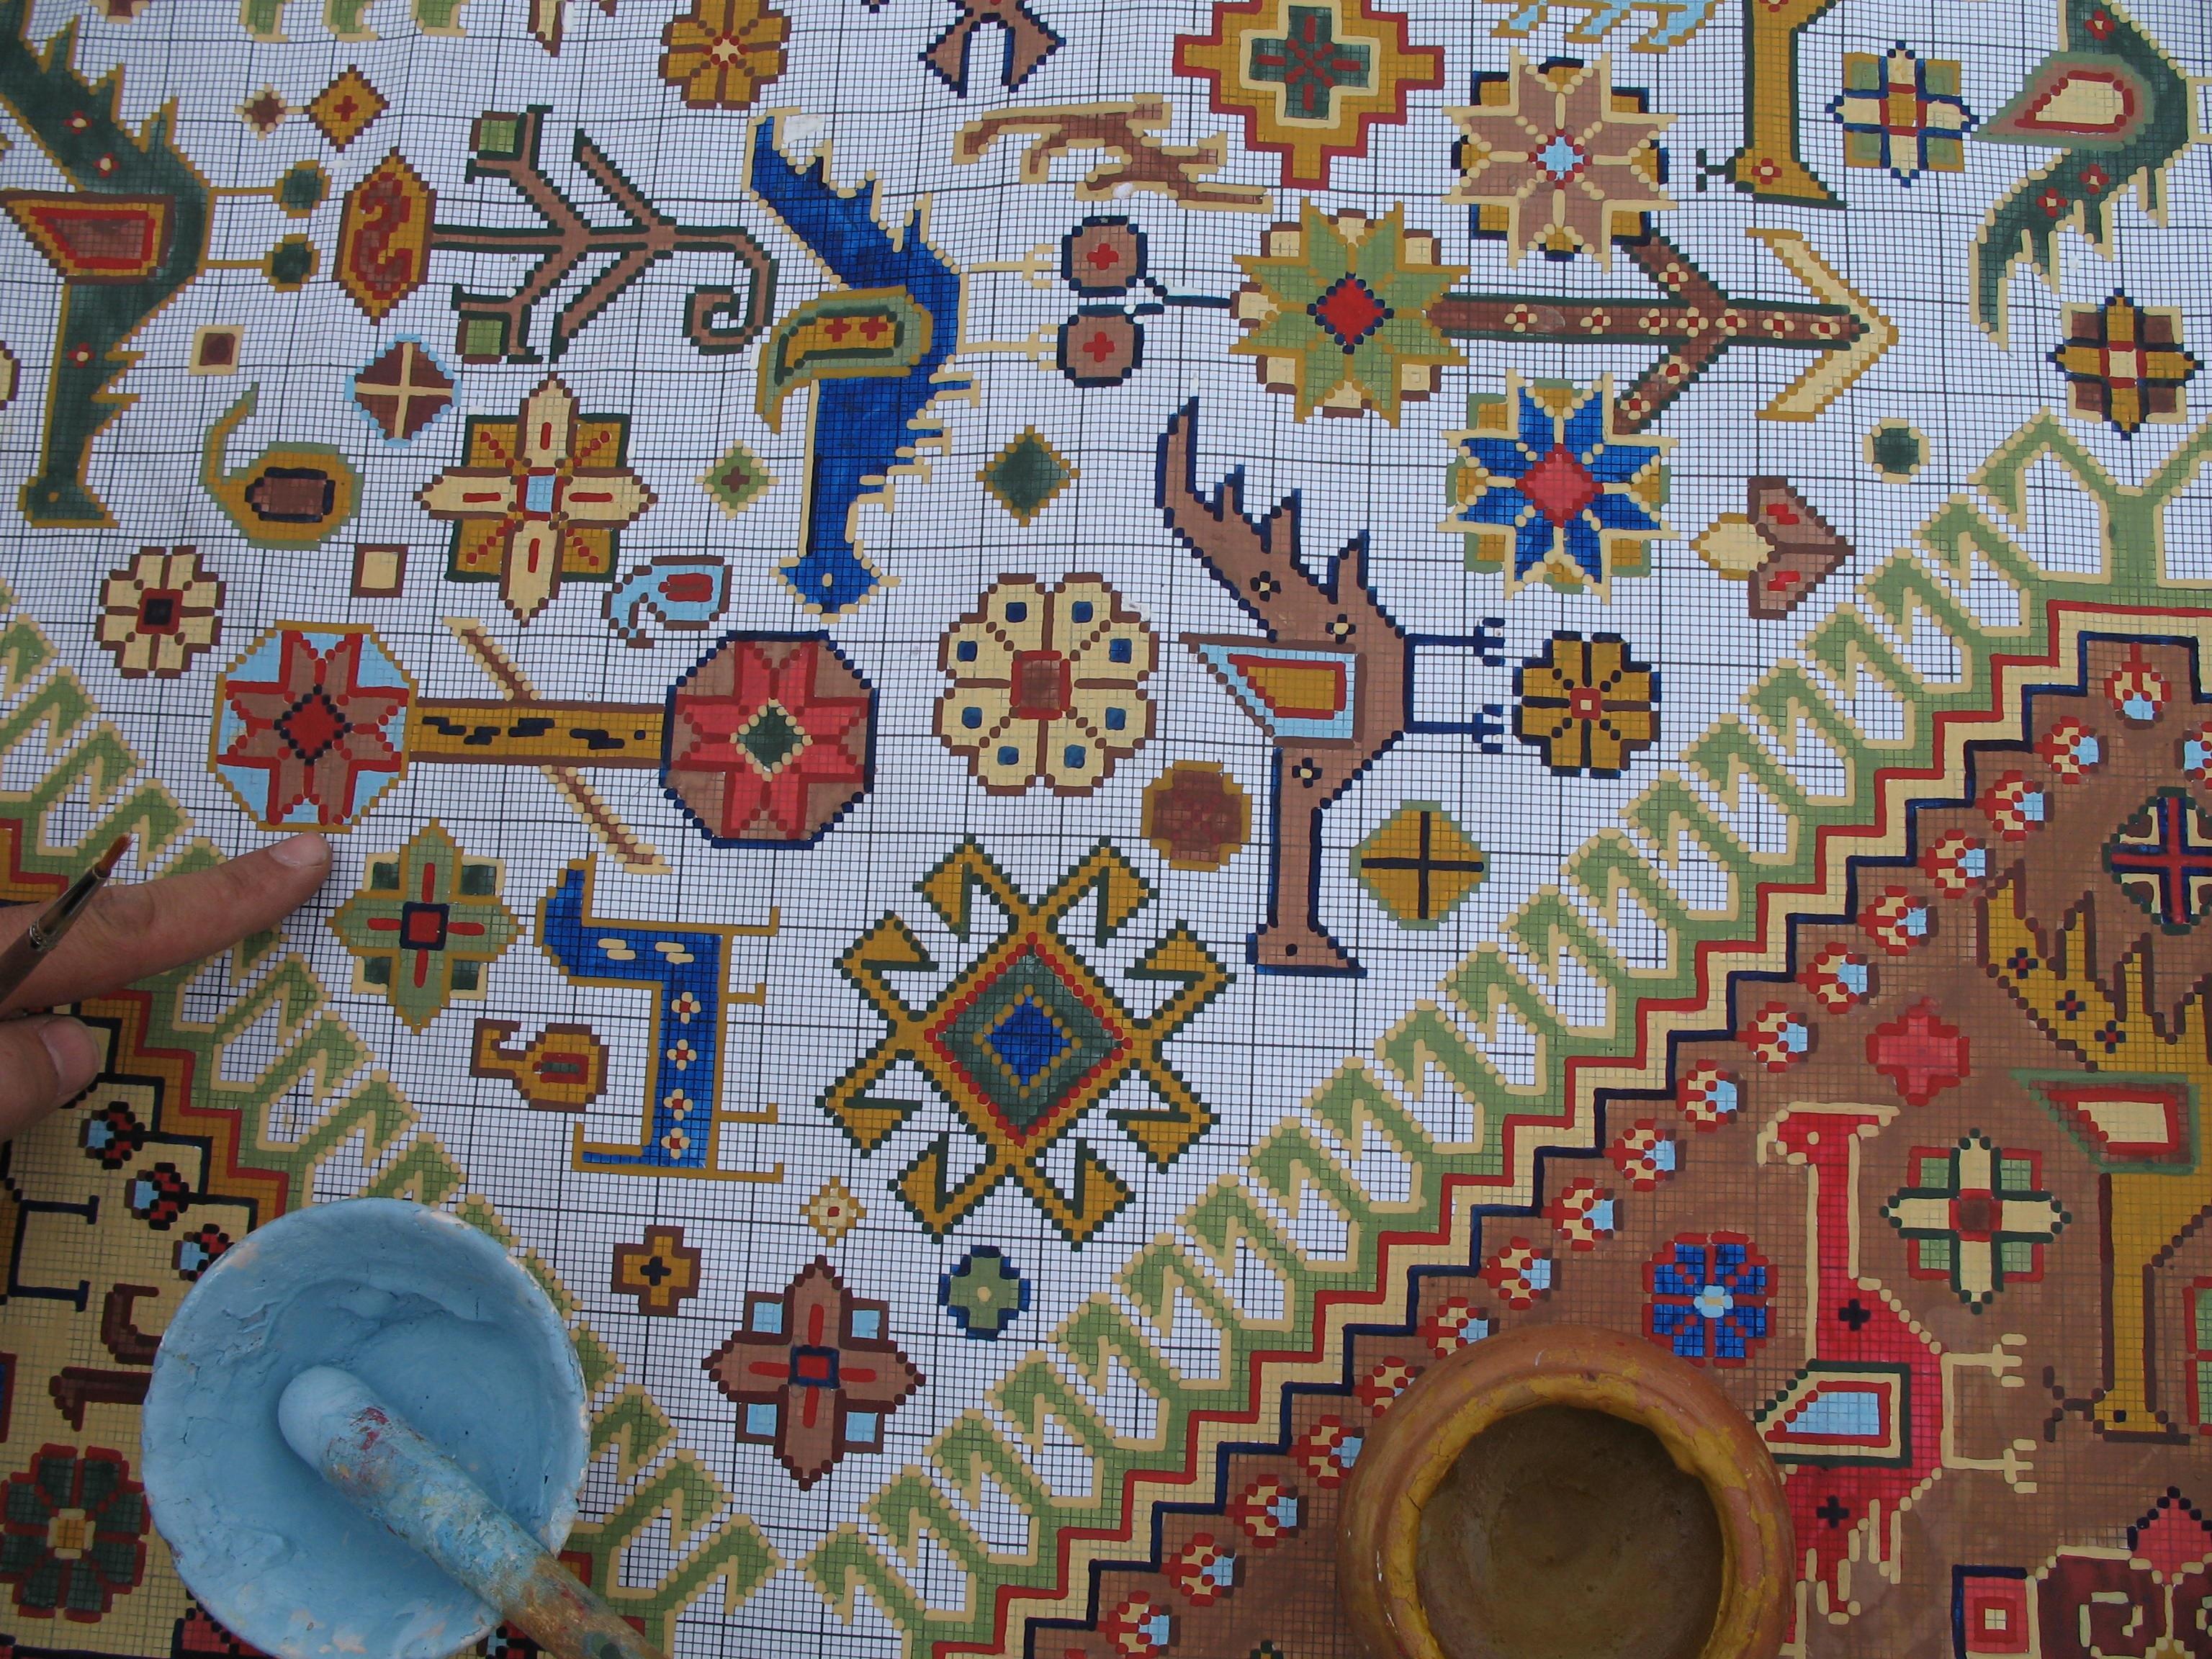 Quilt Block Patterns In Public Domain : Free Images : flower, pattern, color, material, circle, artwork, painting, quilt, textile, art ...